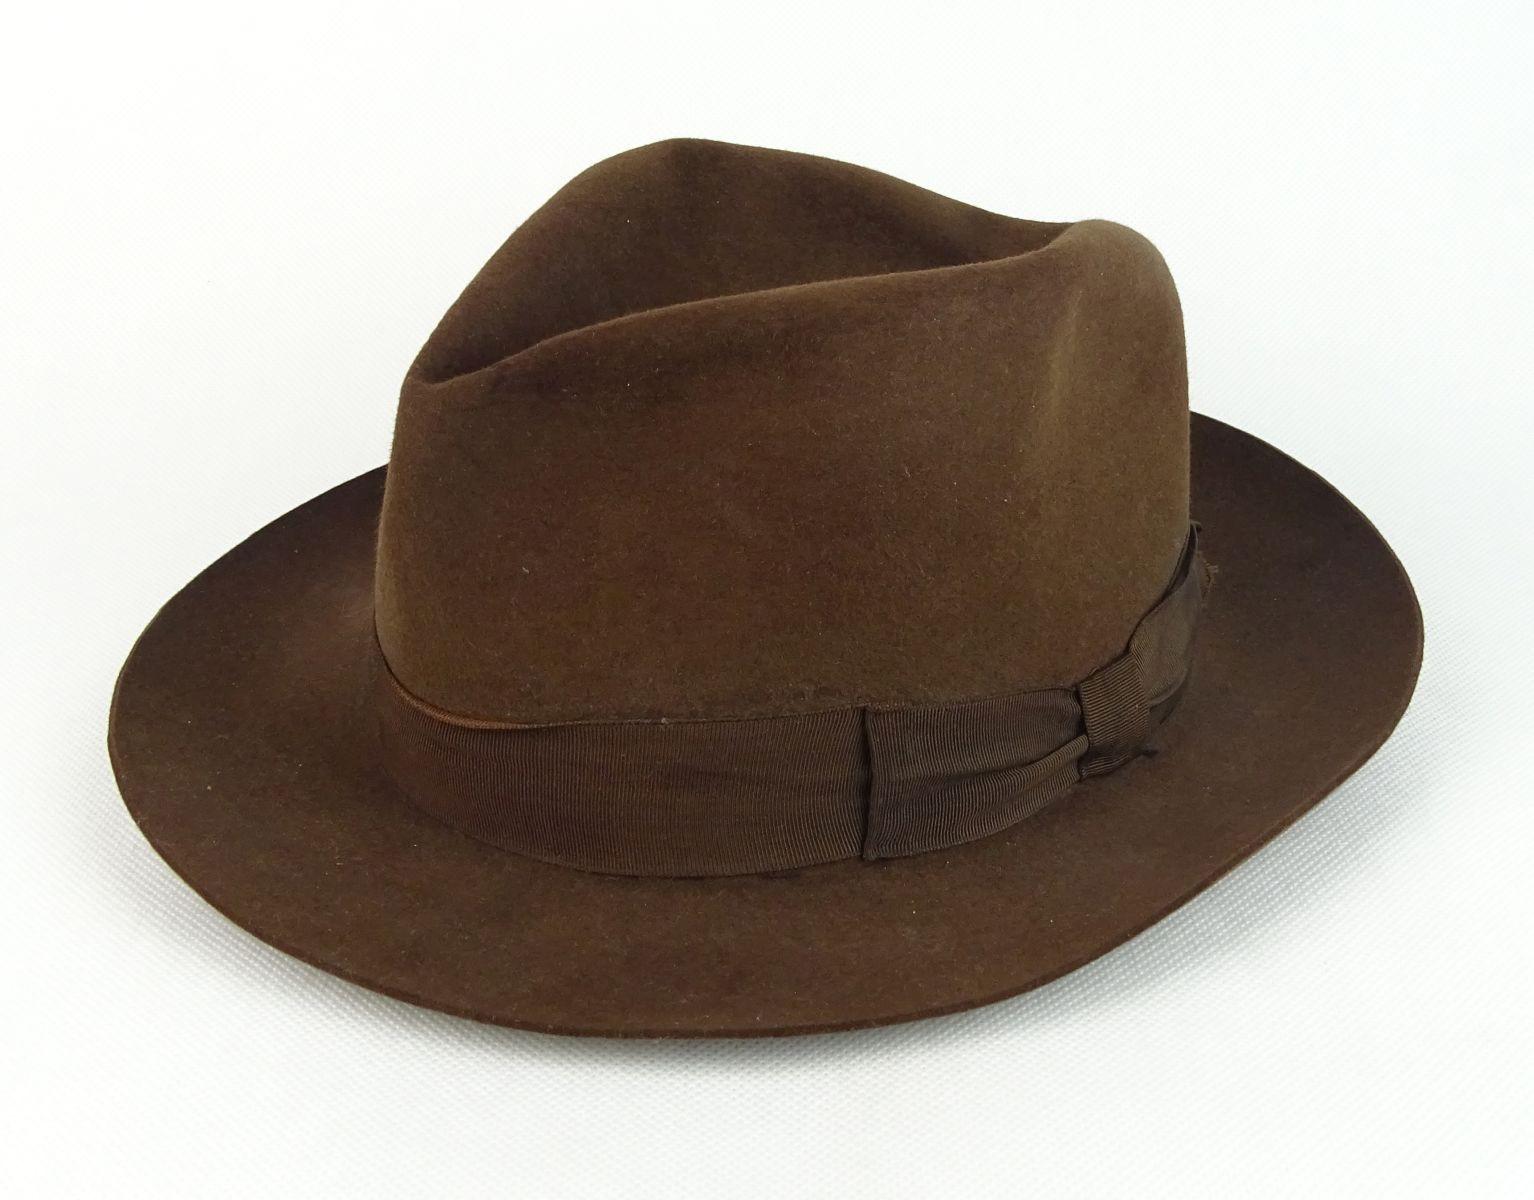 Termékleírás - 0R815 Régi barna Cervantes argentin férfi kalap 73437f70ee